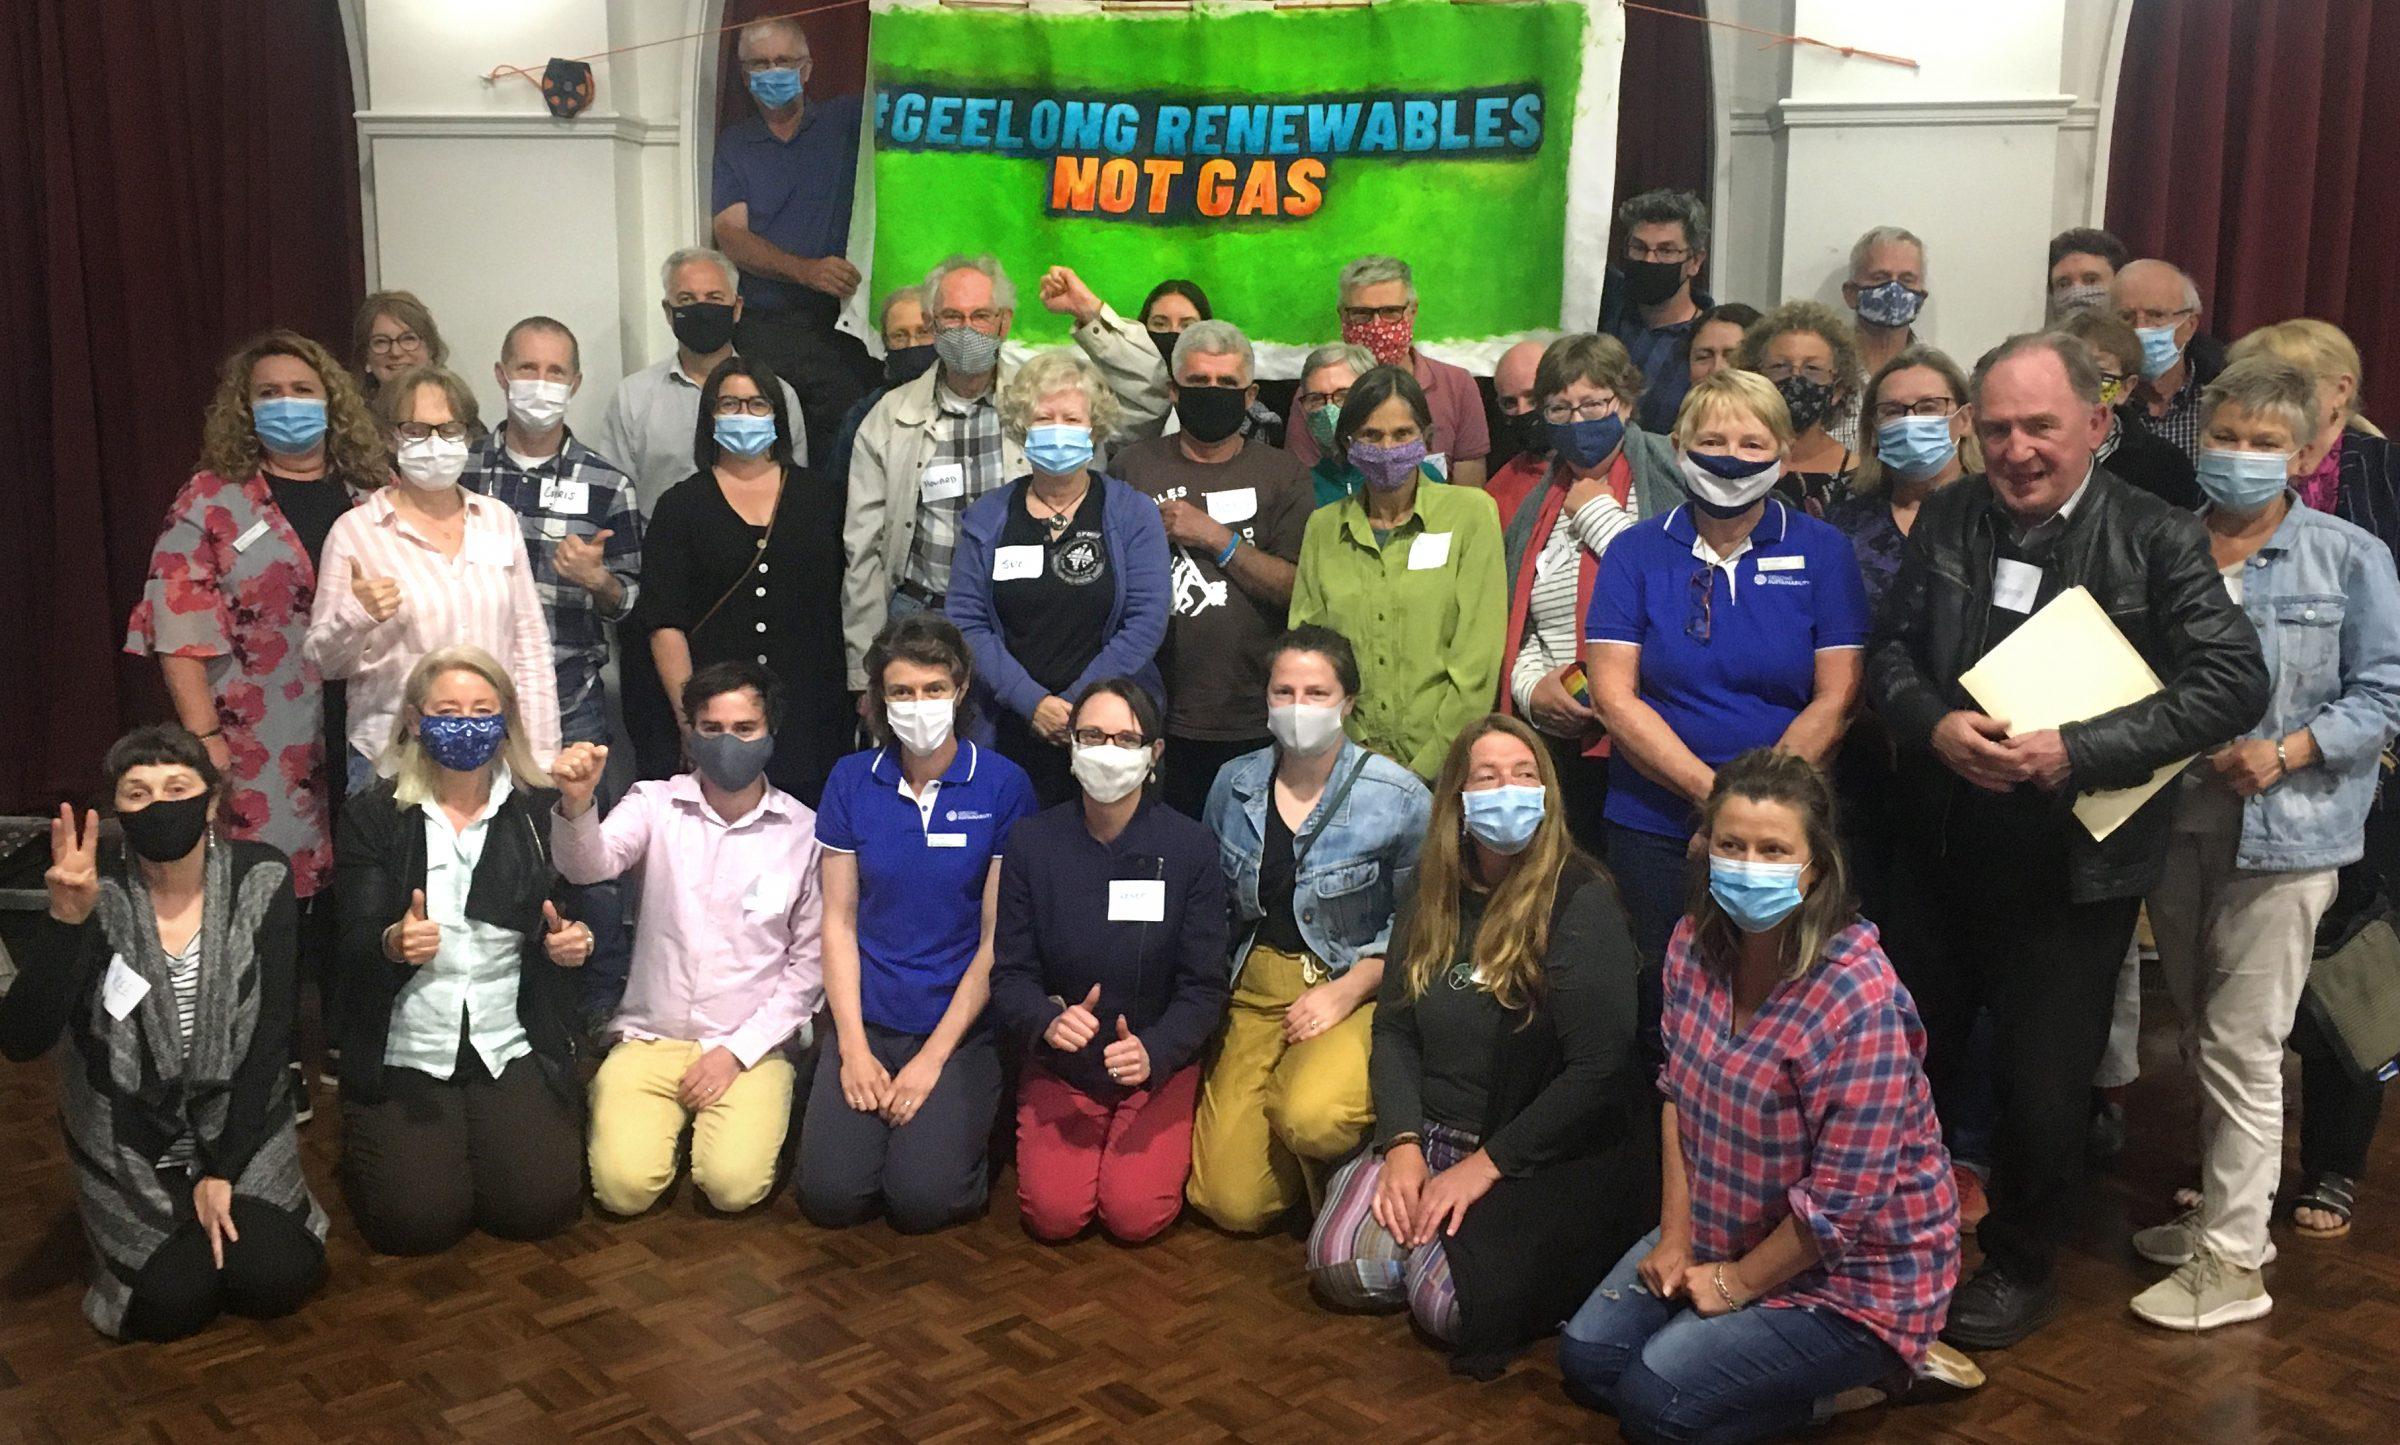 Geelong sustainability